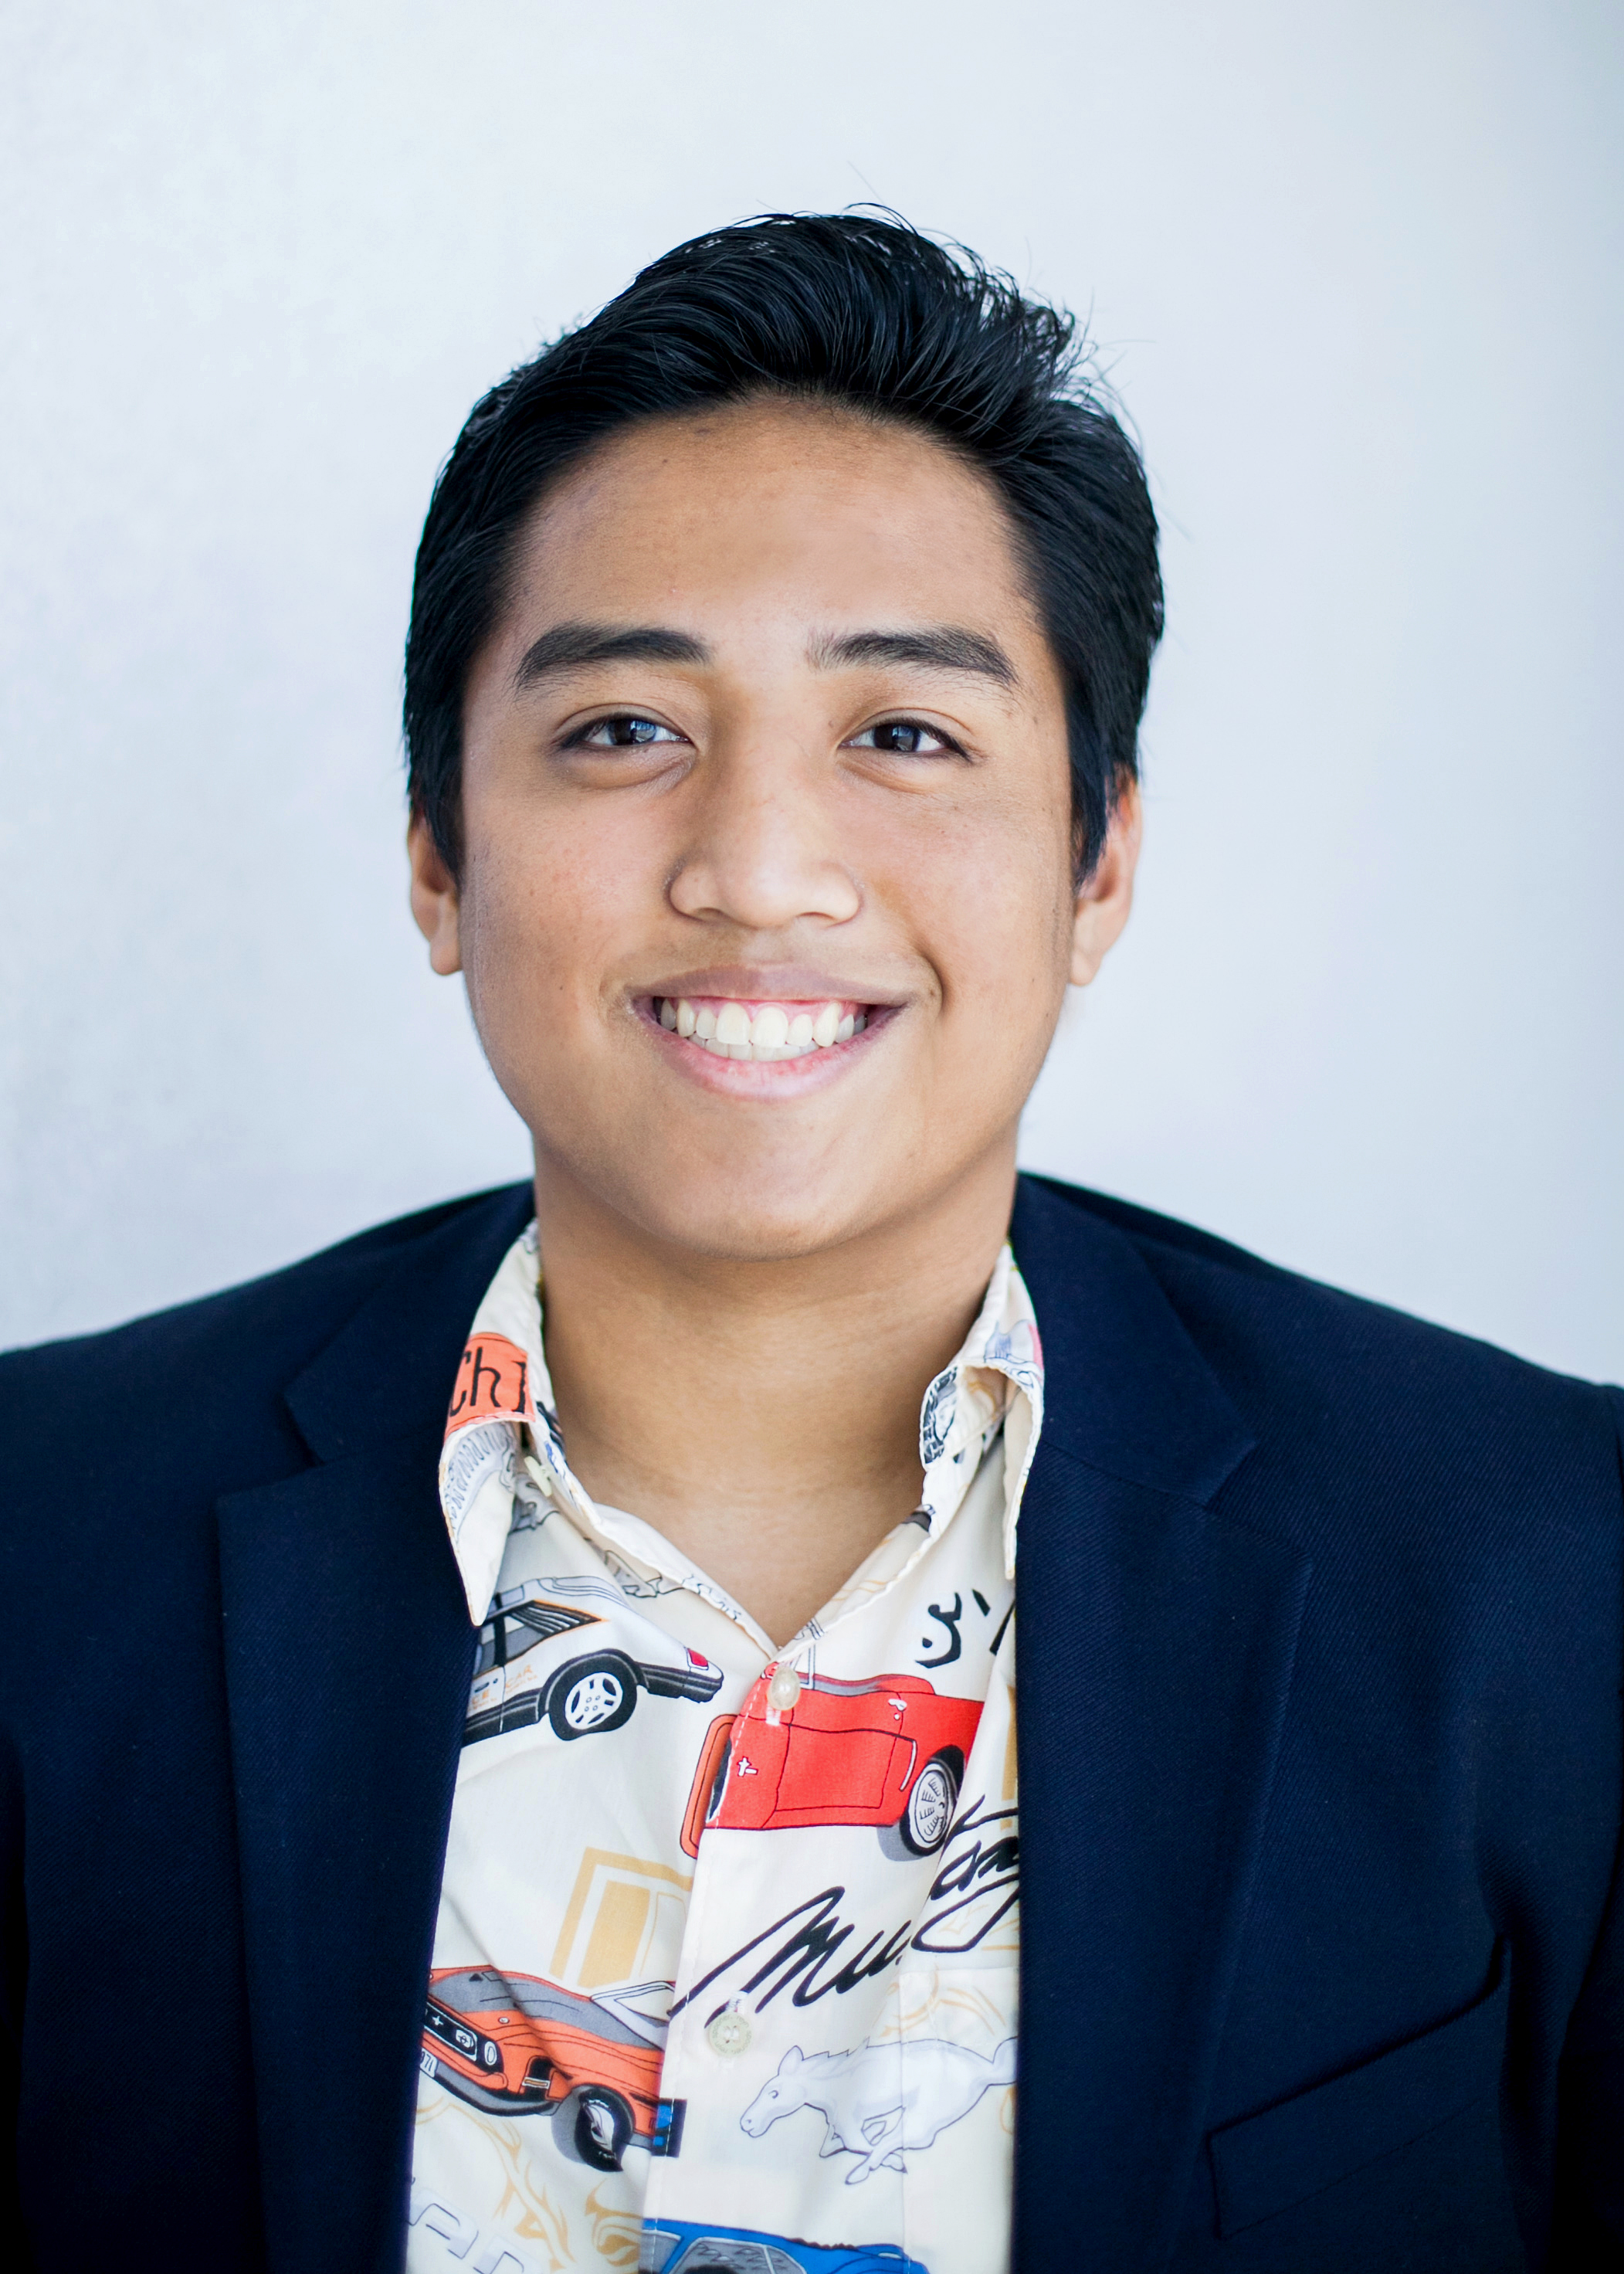 Joshua Luna, 2016, Christian Academy